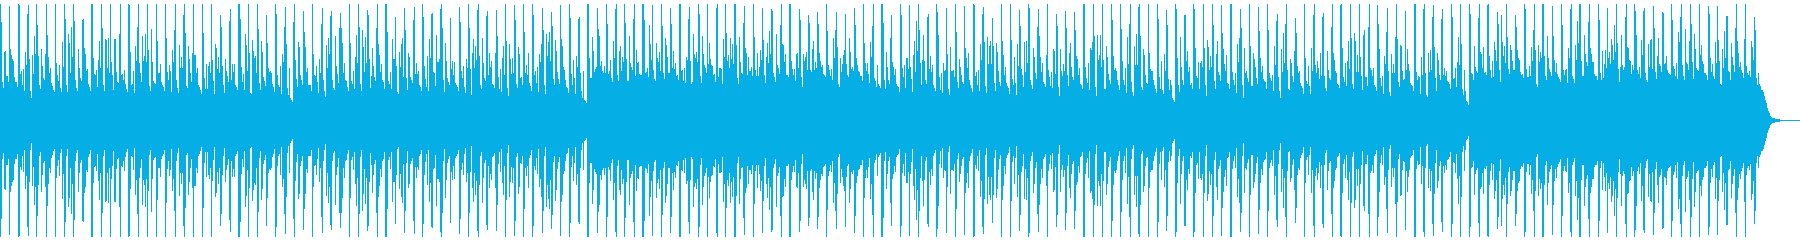 Texture Technoの再生済みの波形